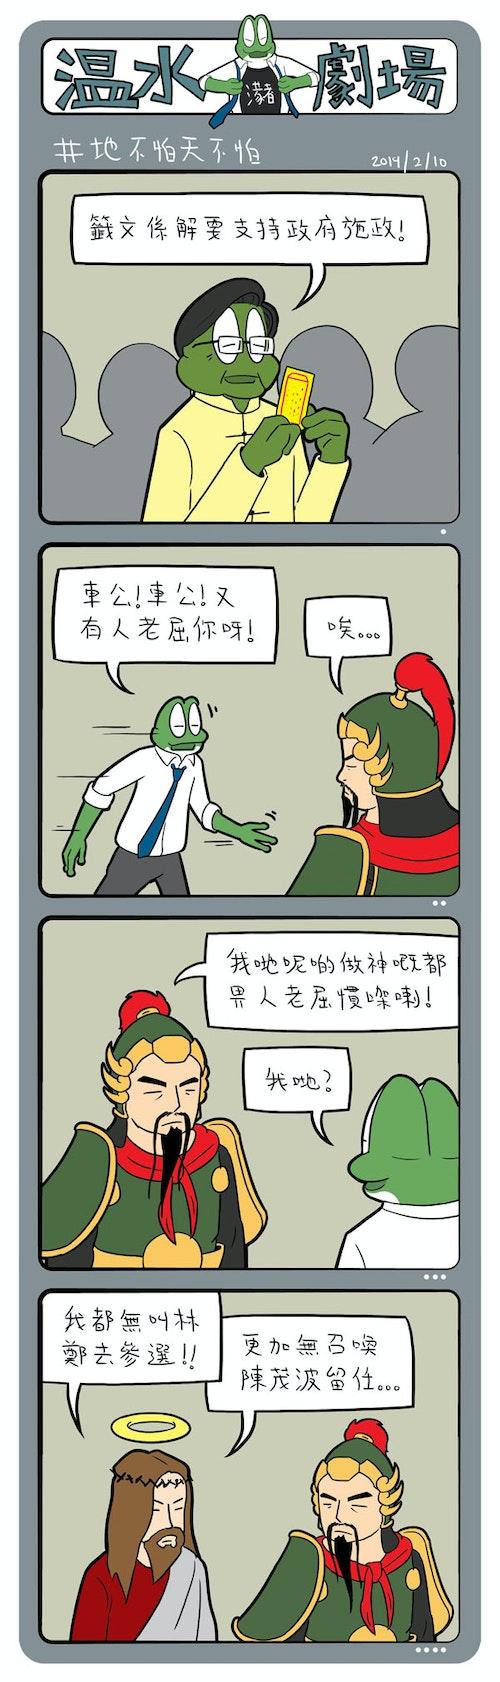 frog_news_lens_189_589